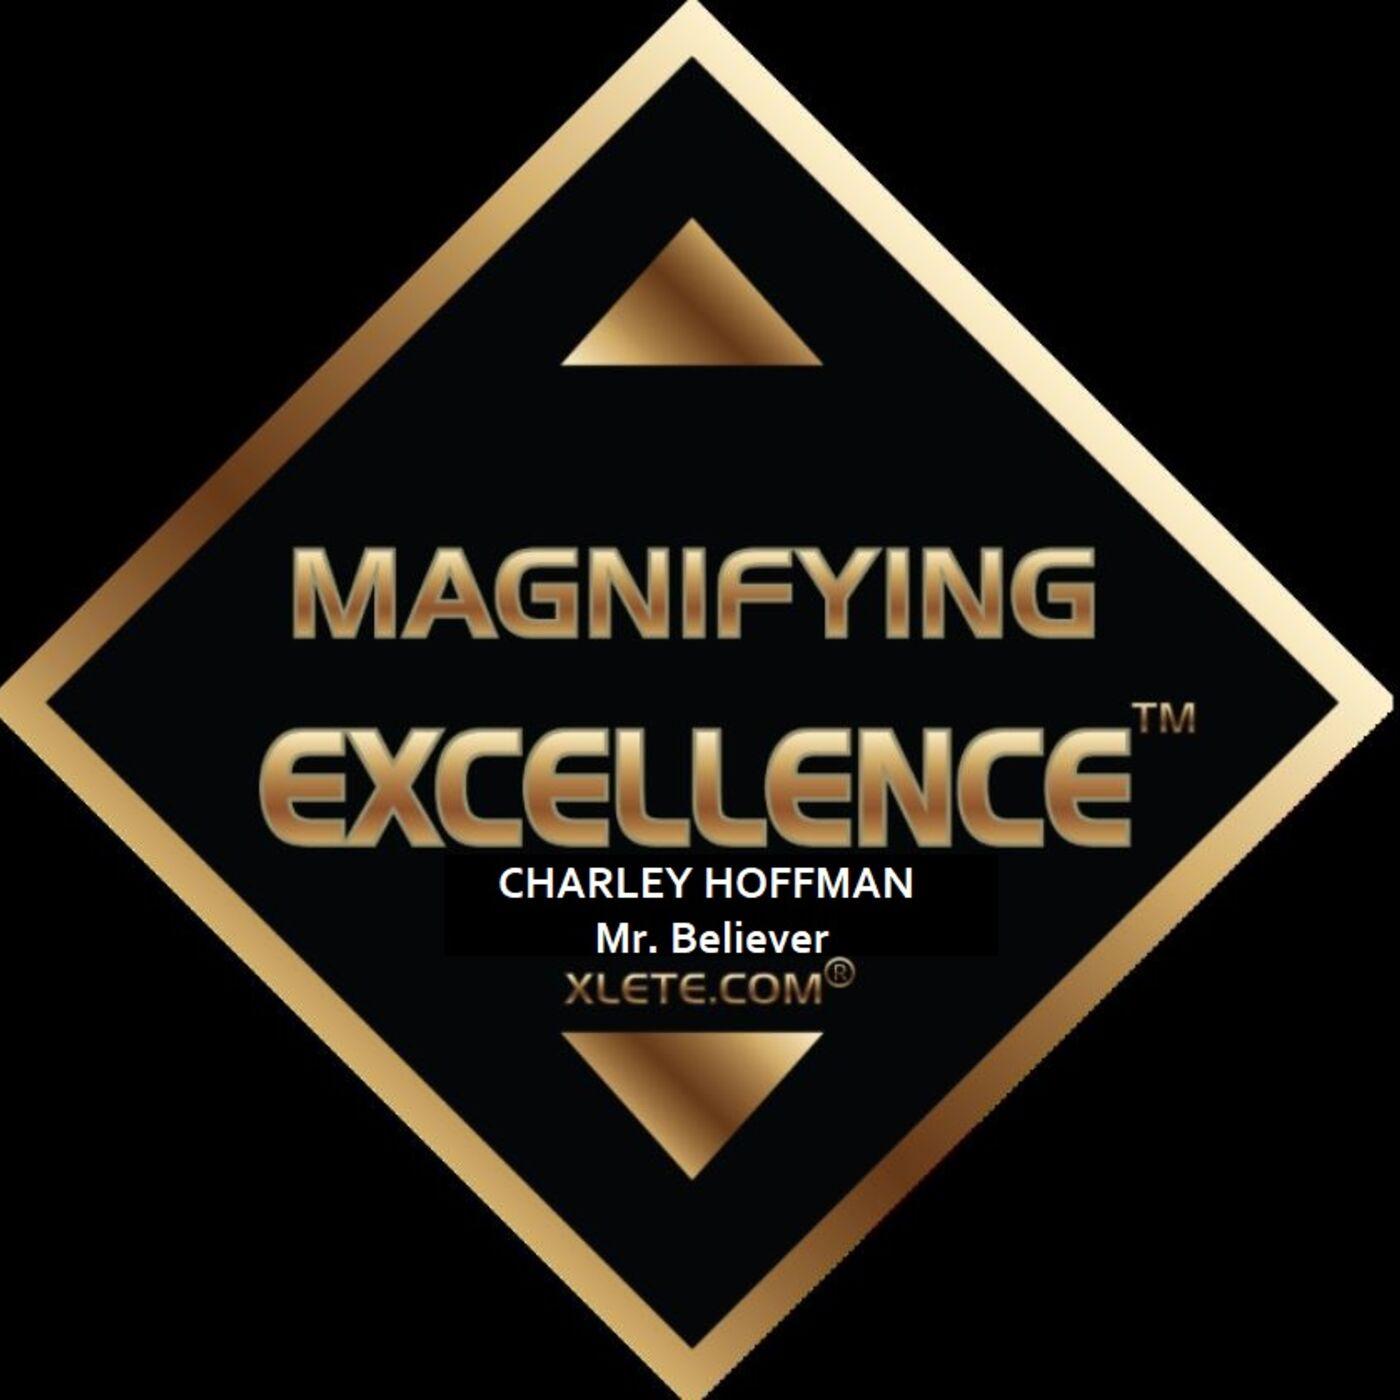 PGA Tour's Charley Hoffman - This Is How Powerful Self Belief Is - Epidose 6